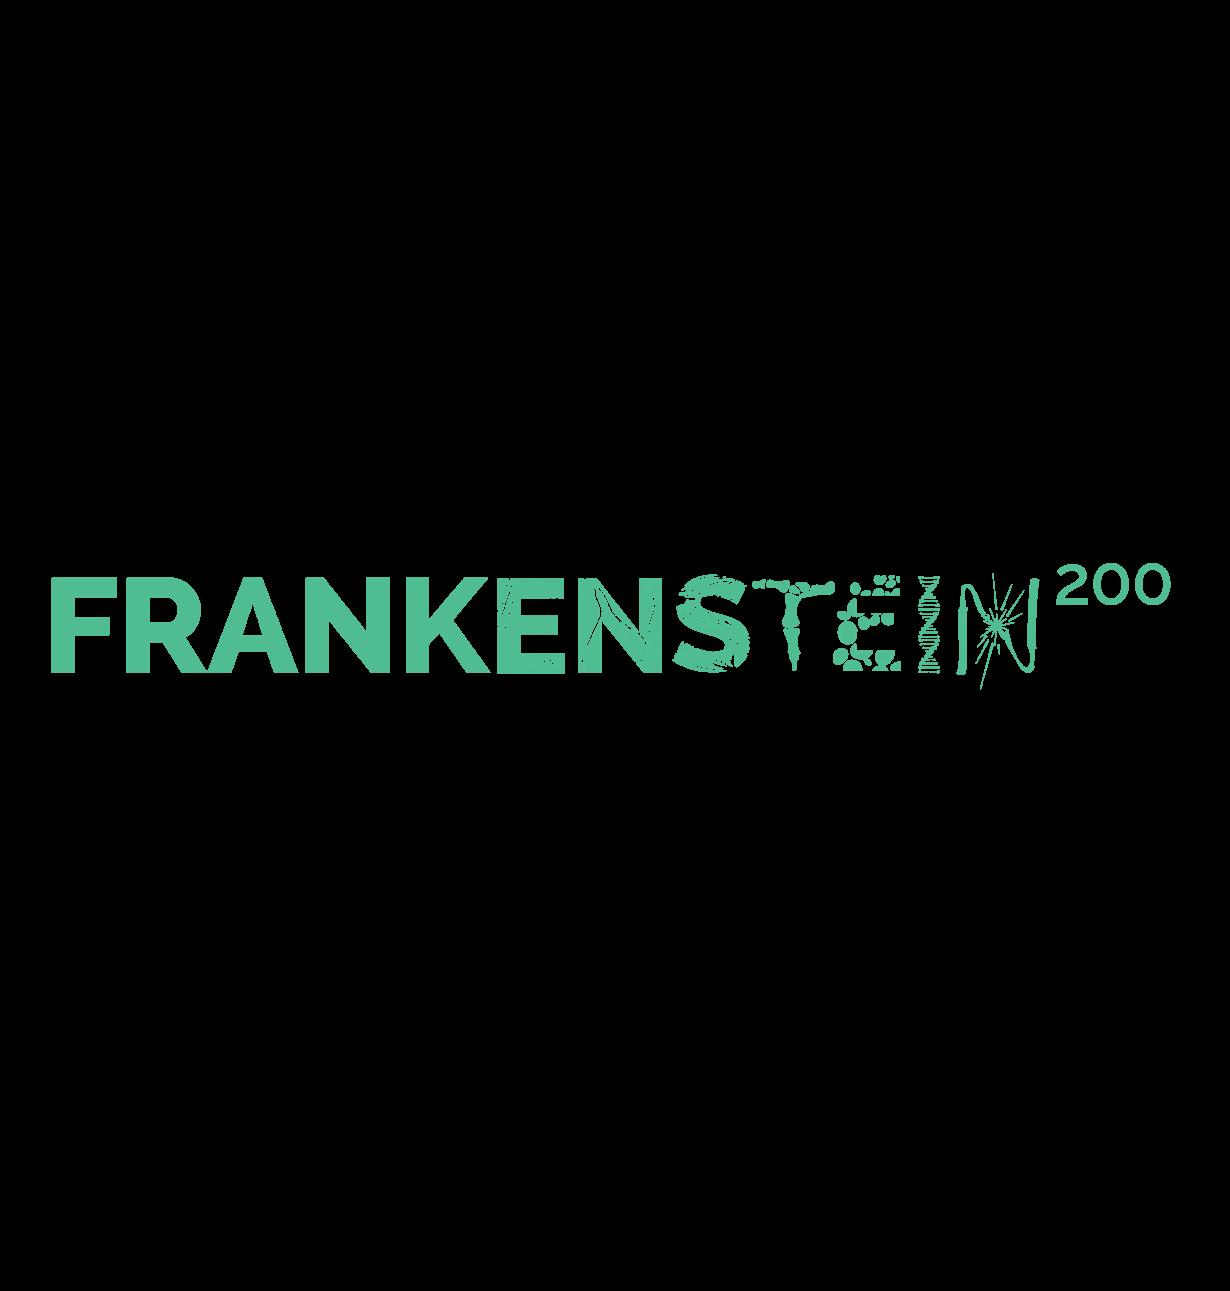 Frankenstein200 logo